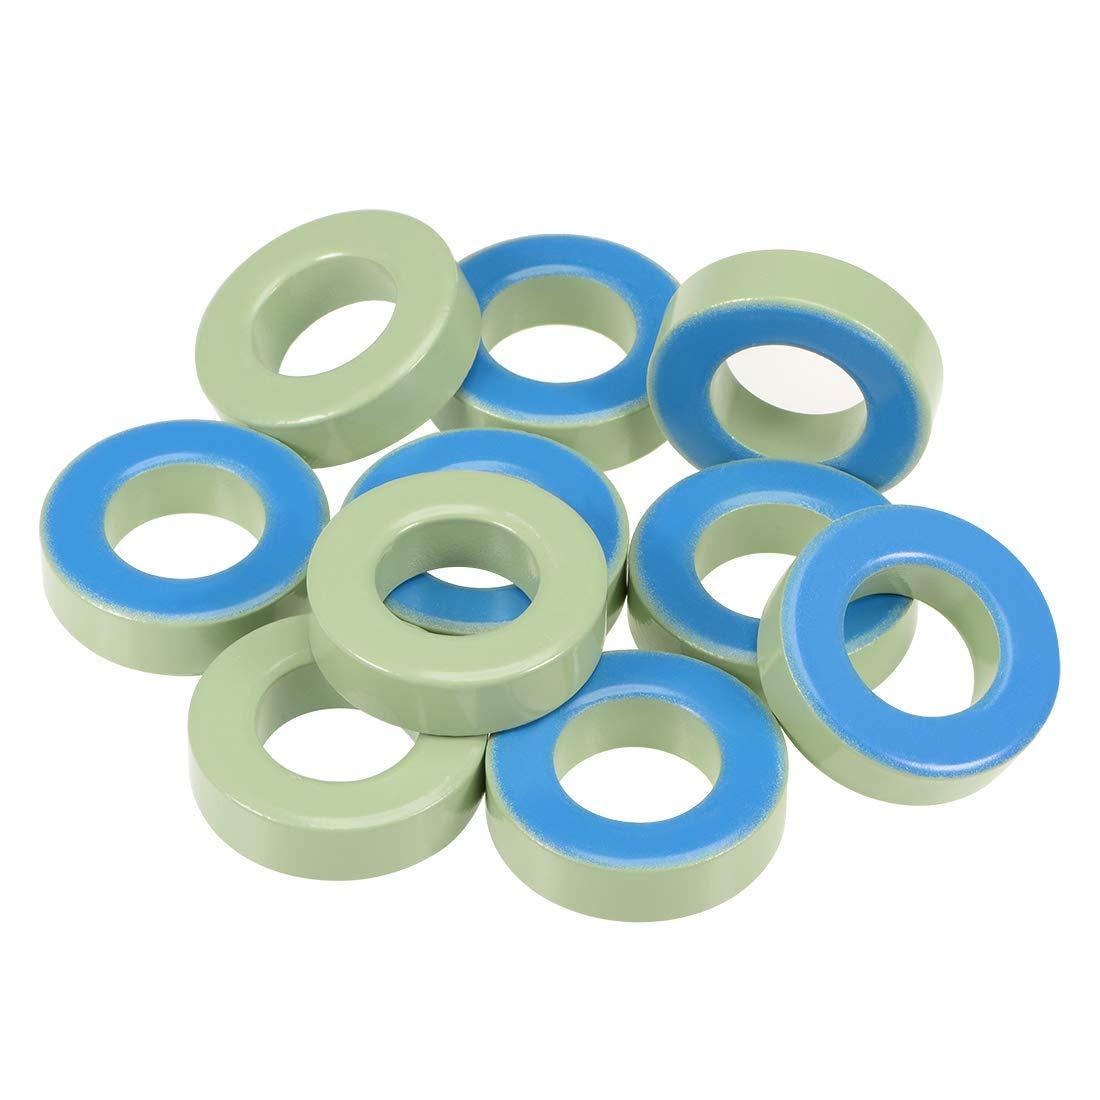 ZCHXD Toroid Core, Ferrite Chokes Ring Iron Powder Inductor Ferrite Rings, Light Green Blue 10pcs, 21.3 x 38.8 x 11.2mm